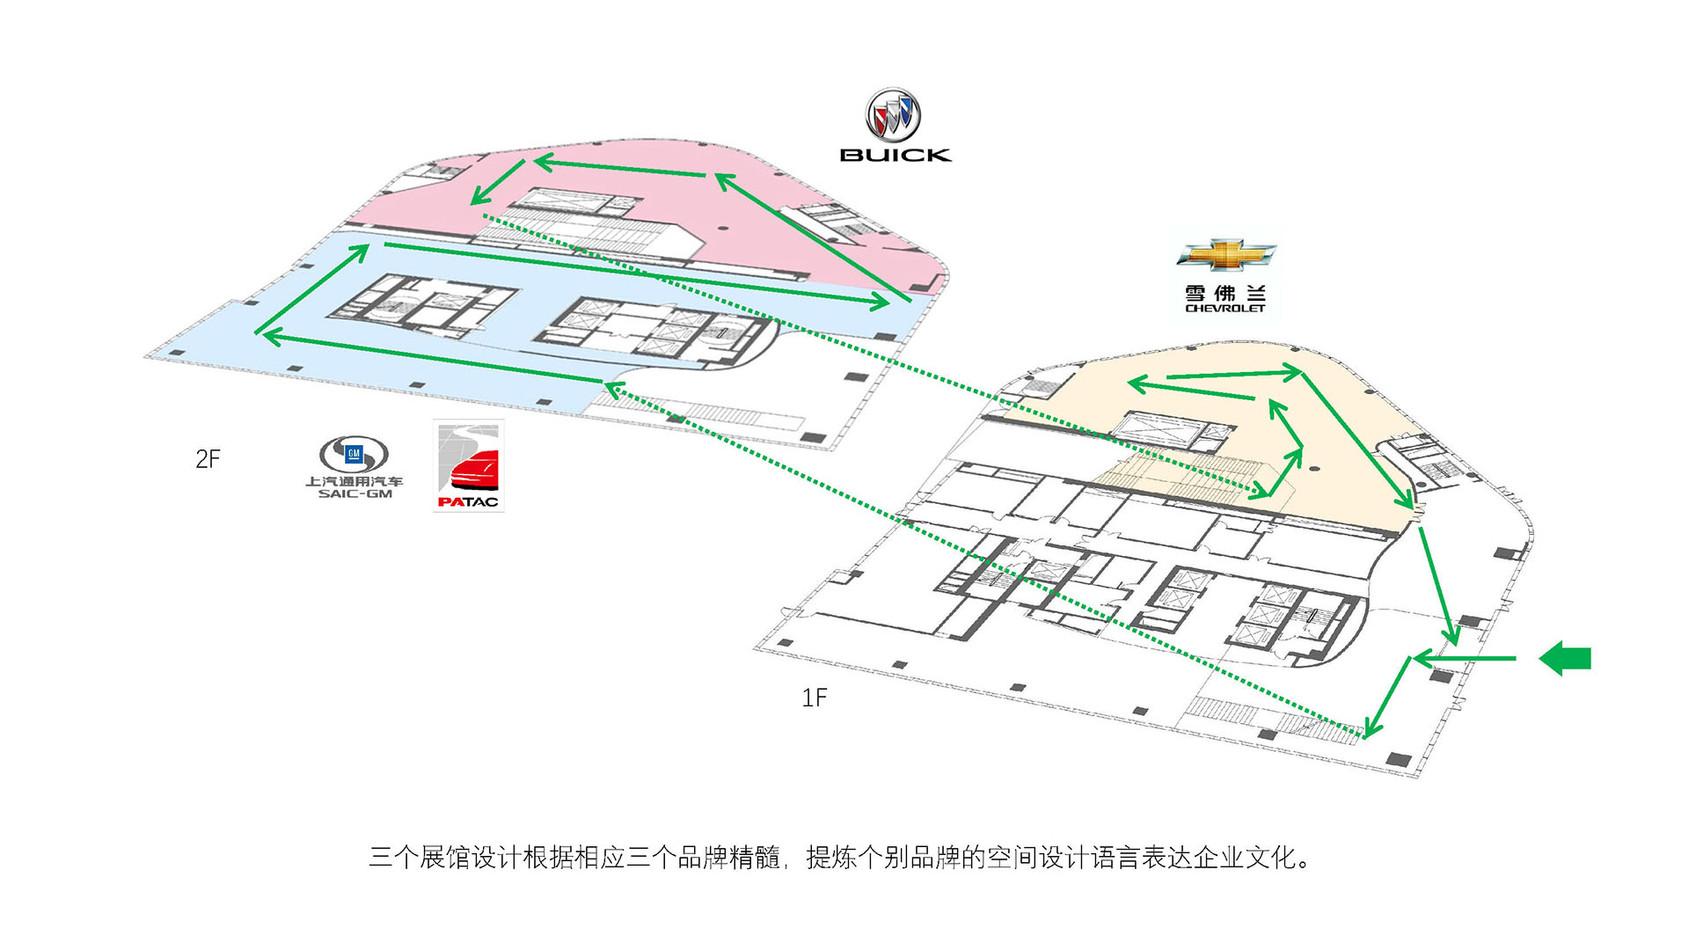 SGM-CORPORATE-MUSEUM-ZH 01.jpg